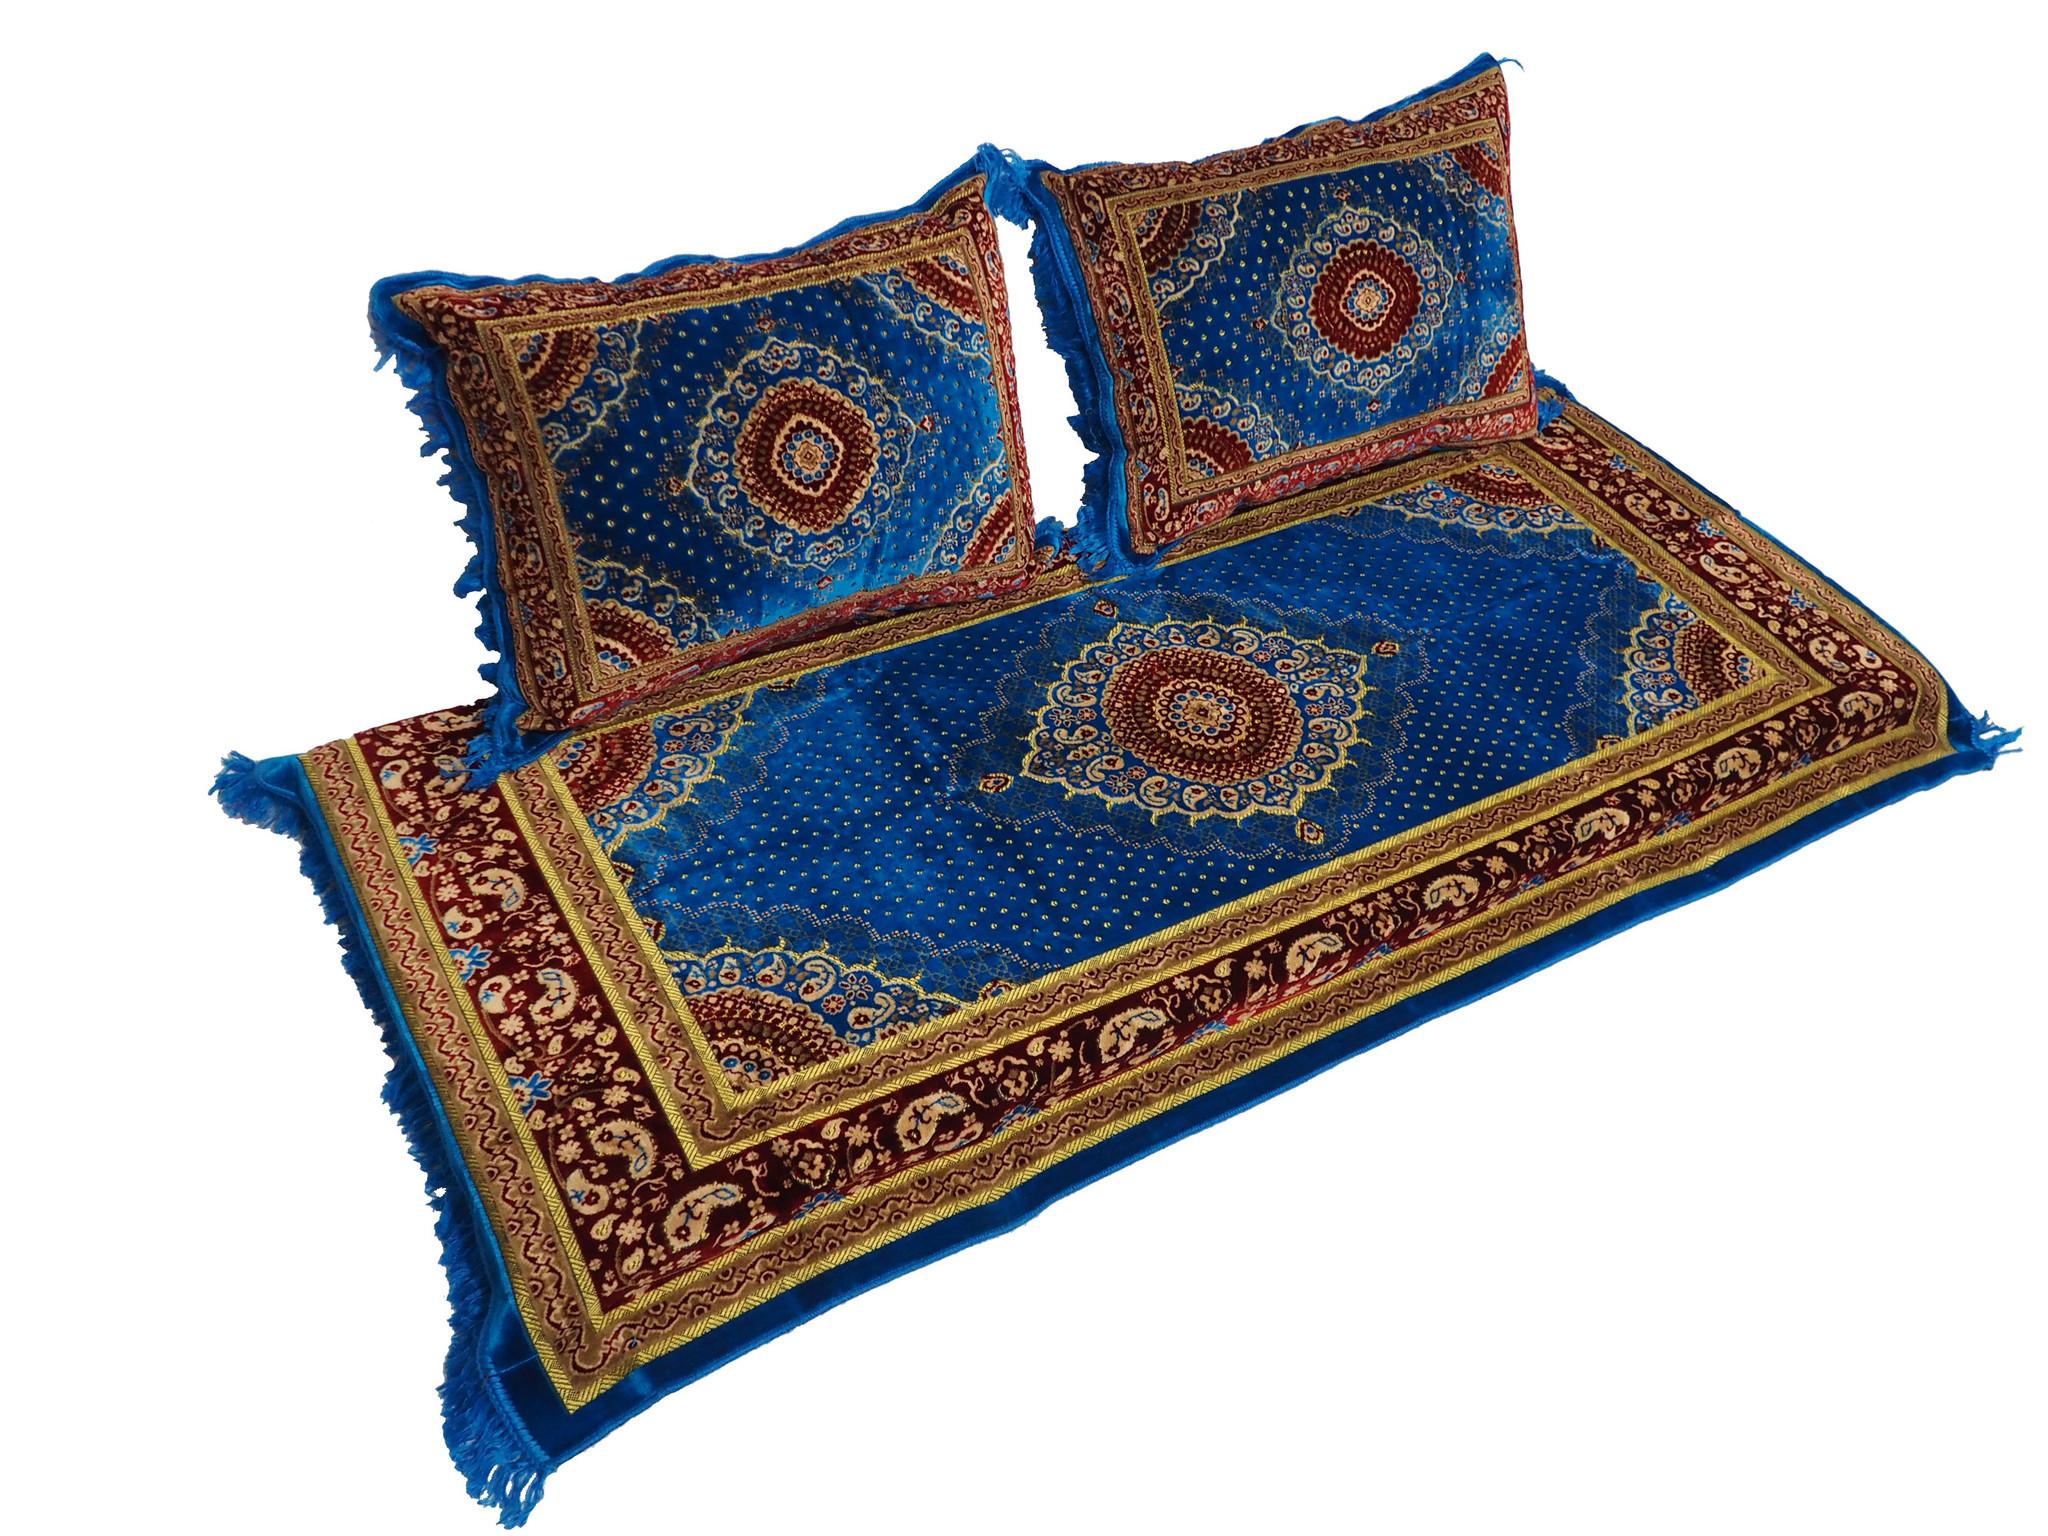 Set of 3 Pcs  1x Mattress  + 2x cushions orient Afghan nomad pillow rug seat floor cushion 1001-night Seating  majlis Toshak توشک  (blue red)